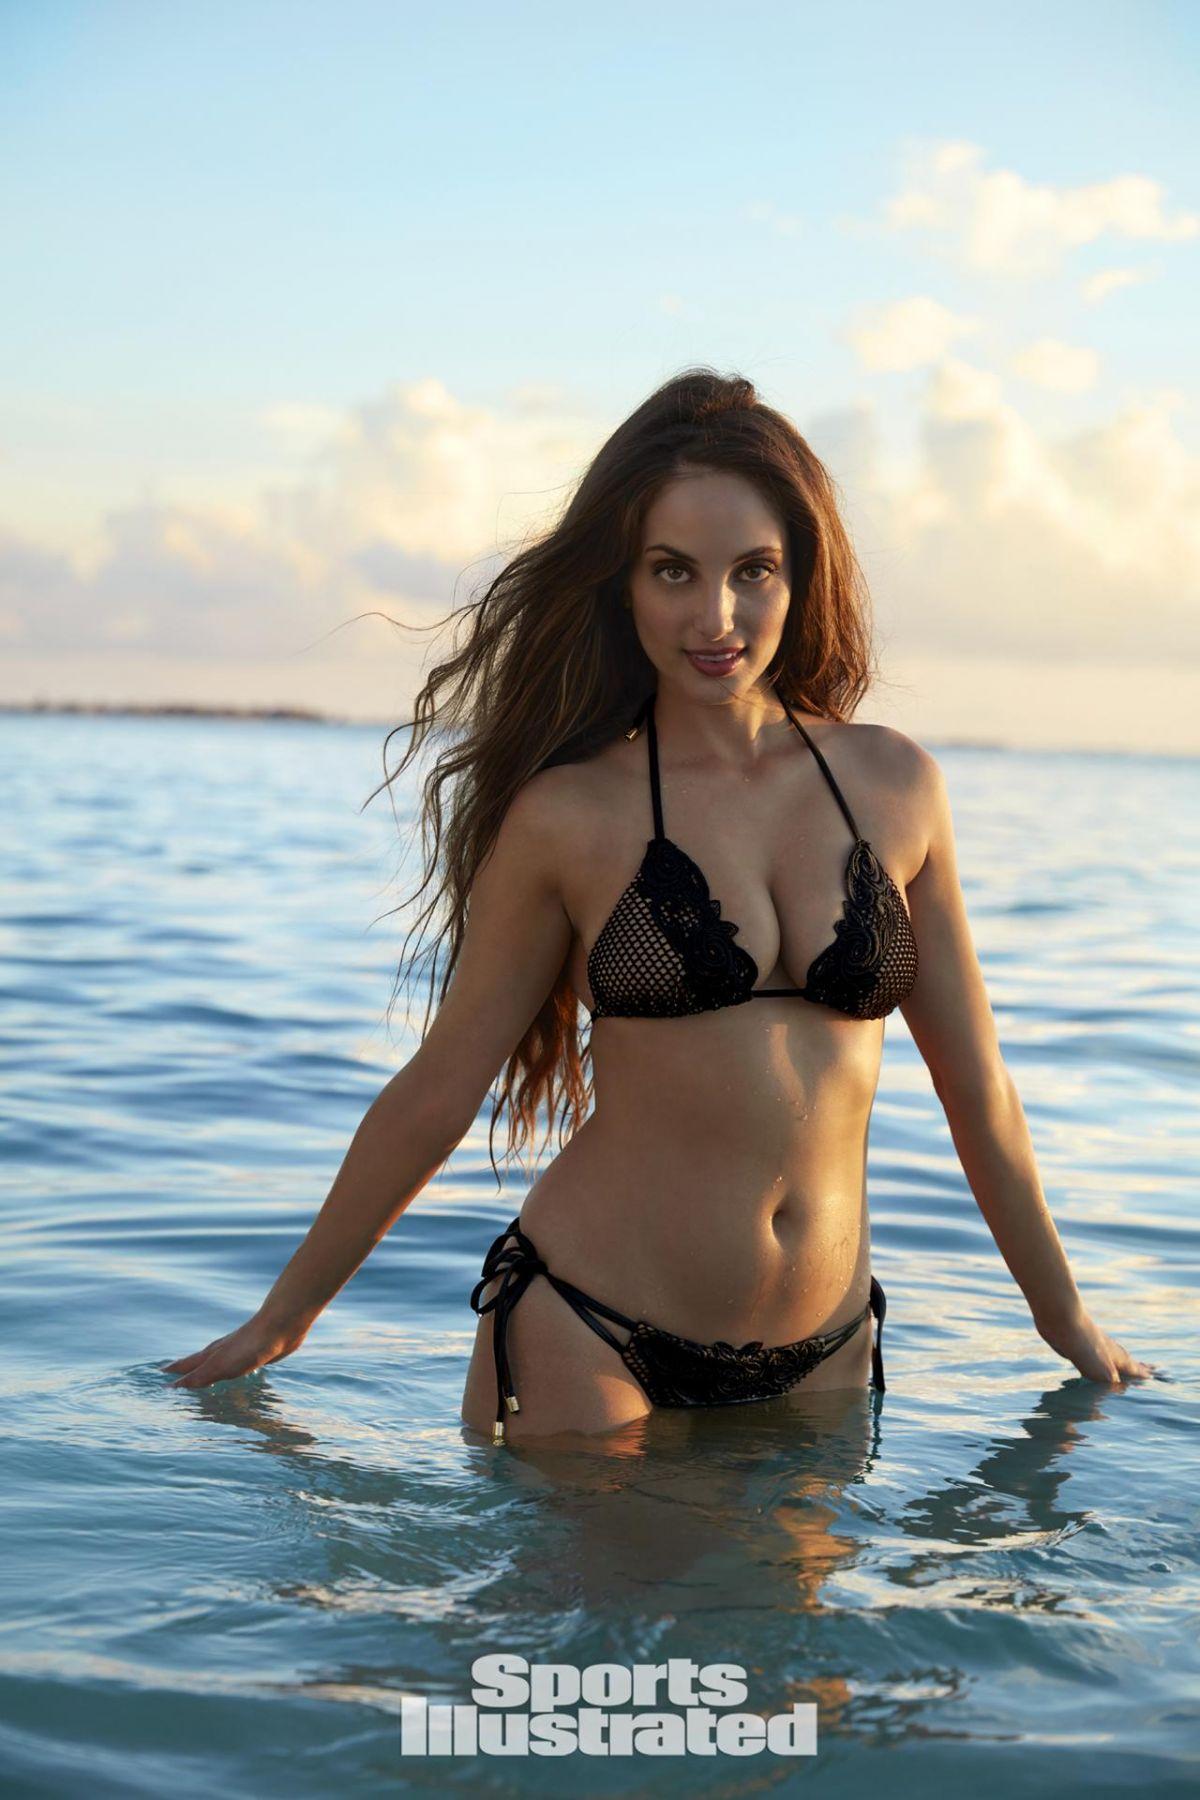 Bikini Alexa Ray Joel nude photos 2019